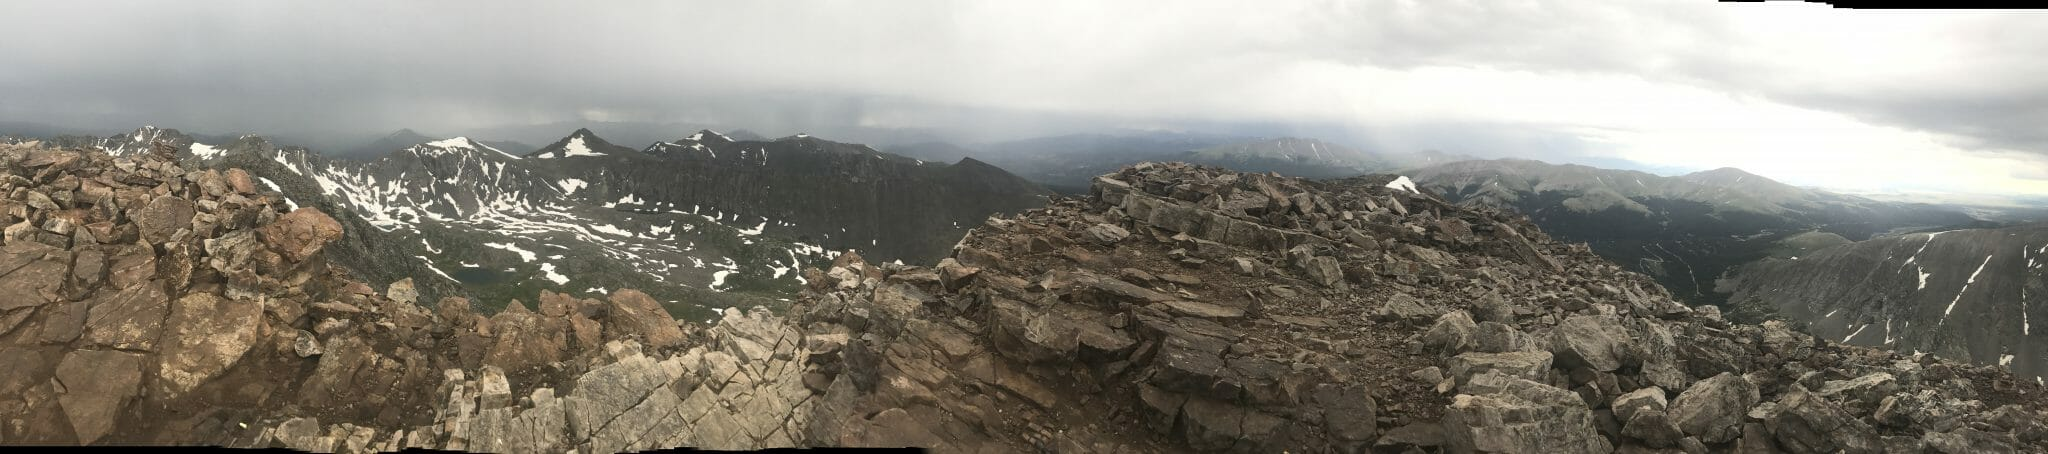 Quandary Peak Panorama